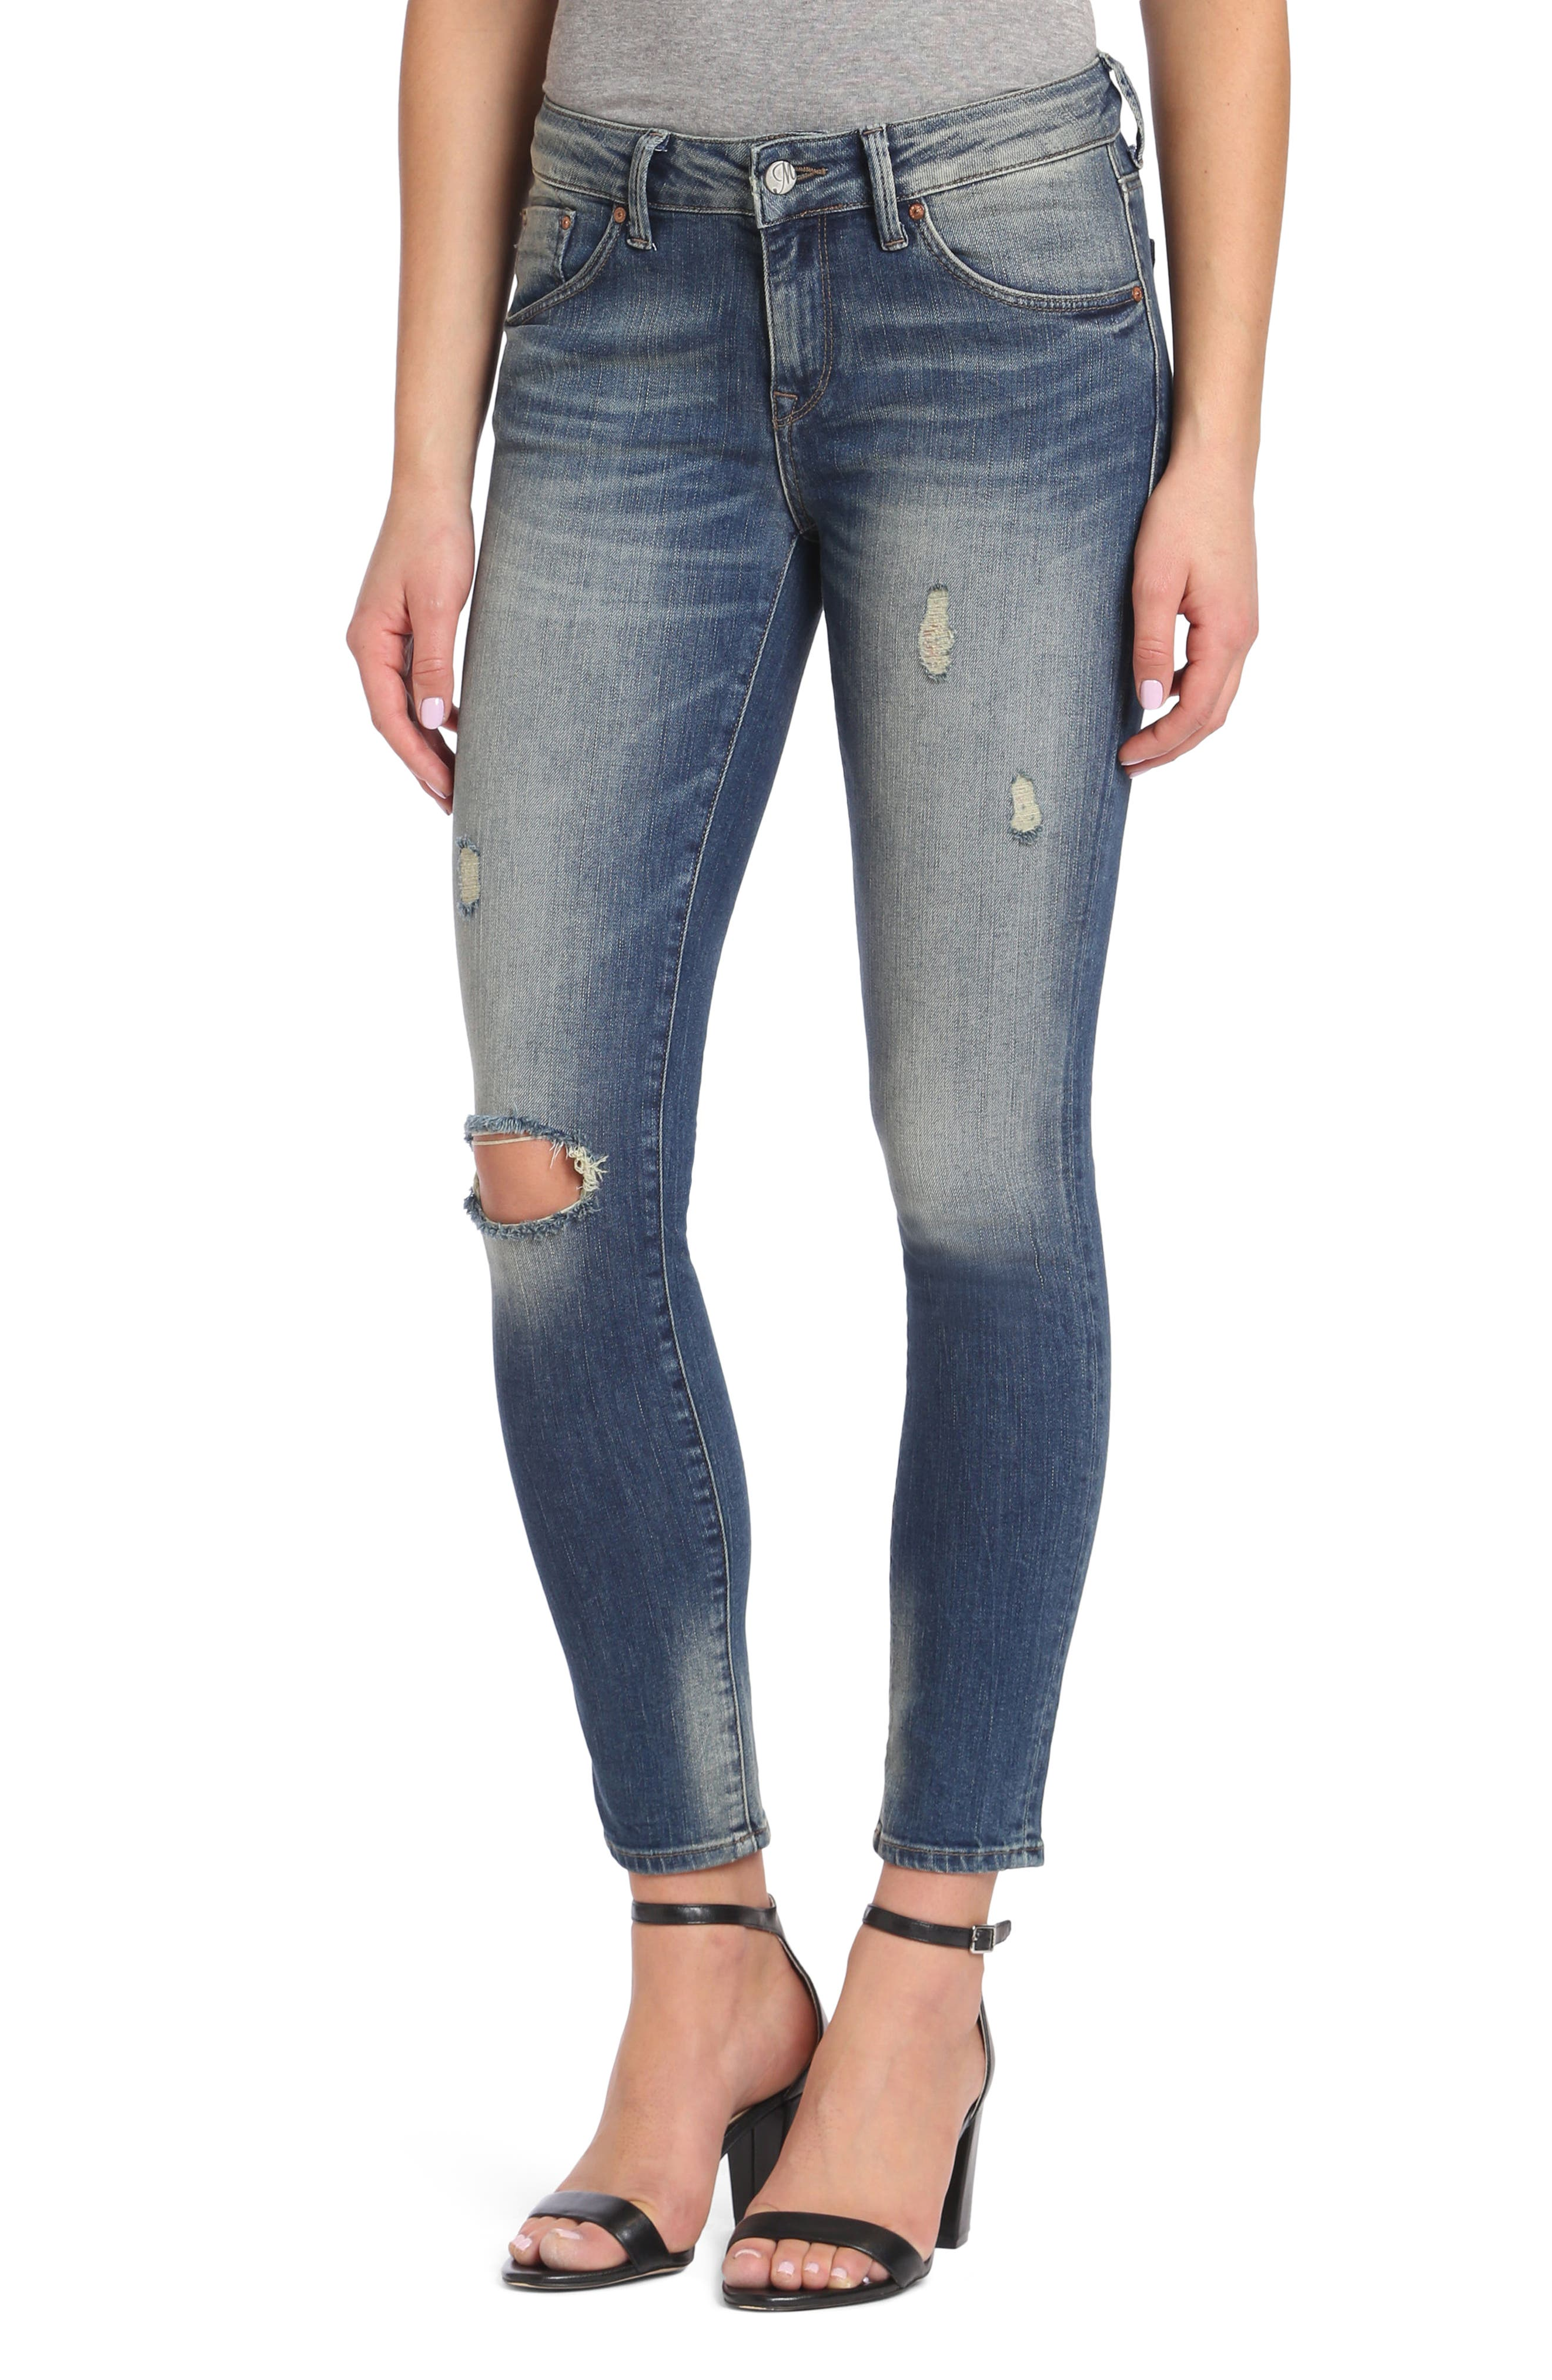 Main Image - Mavi Jeans Adriana Stretch Skinny Jeans (Mid Shaded Glam Vintage)